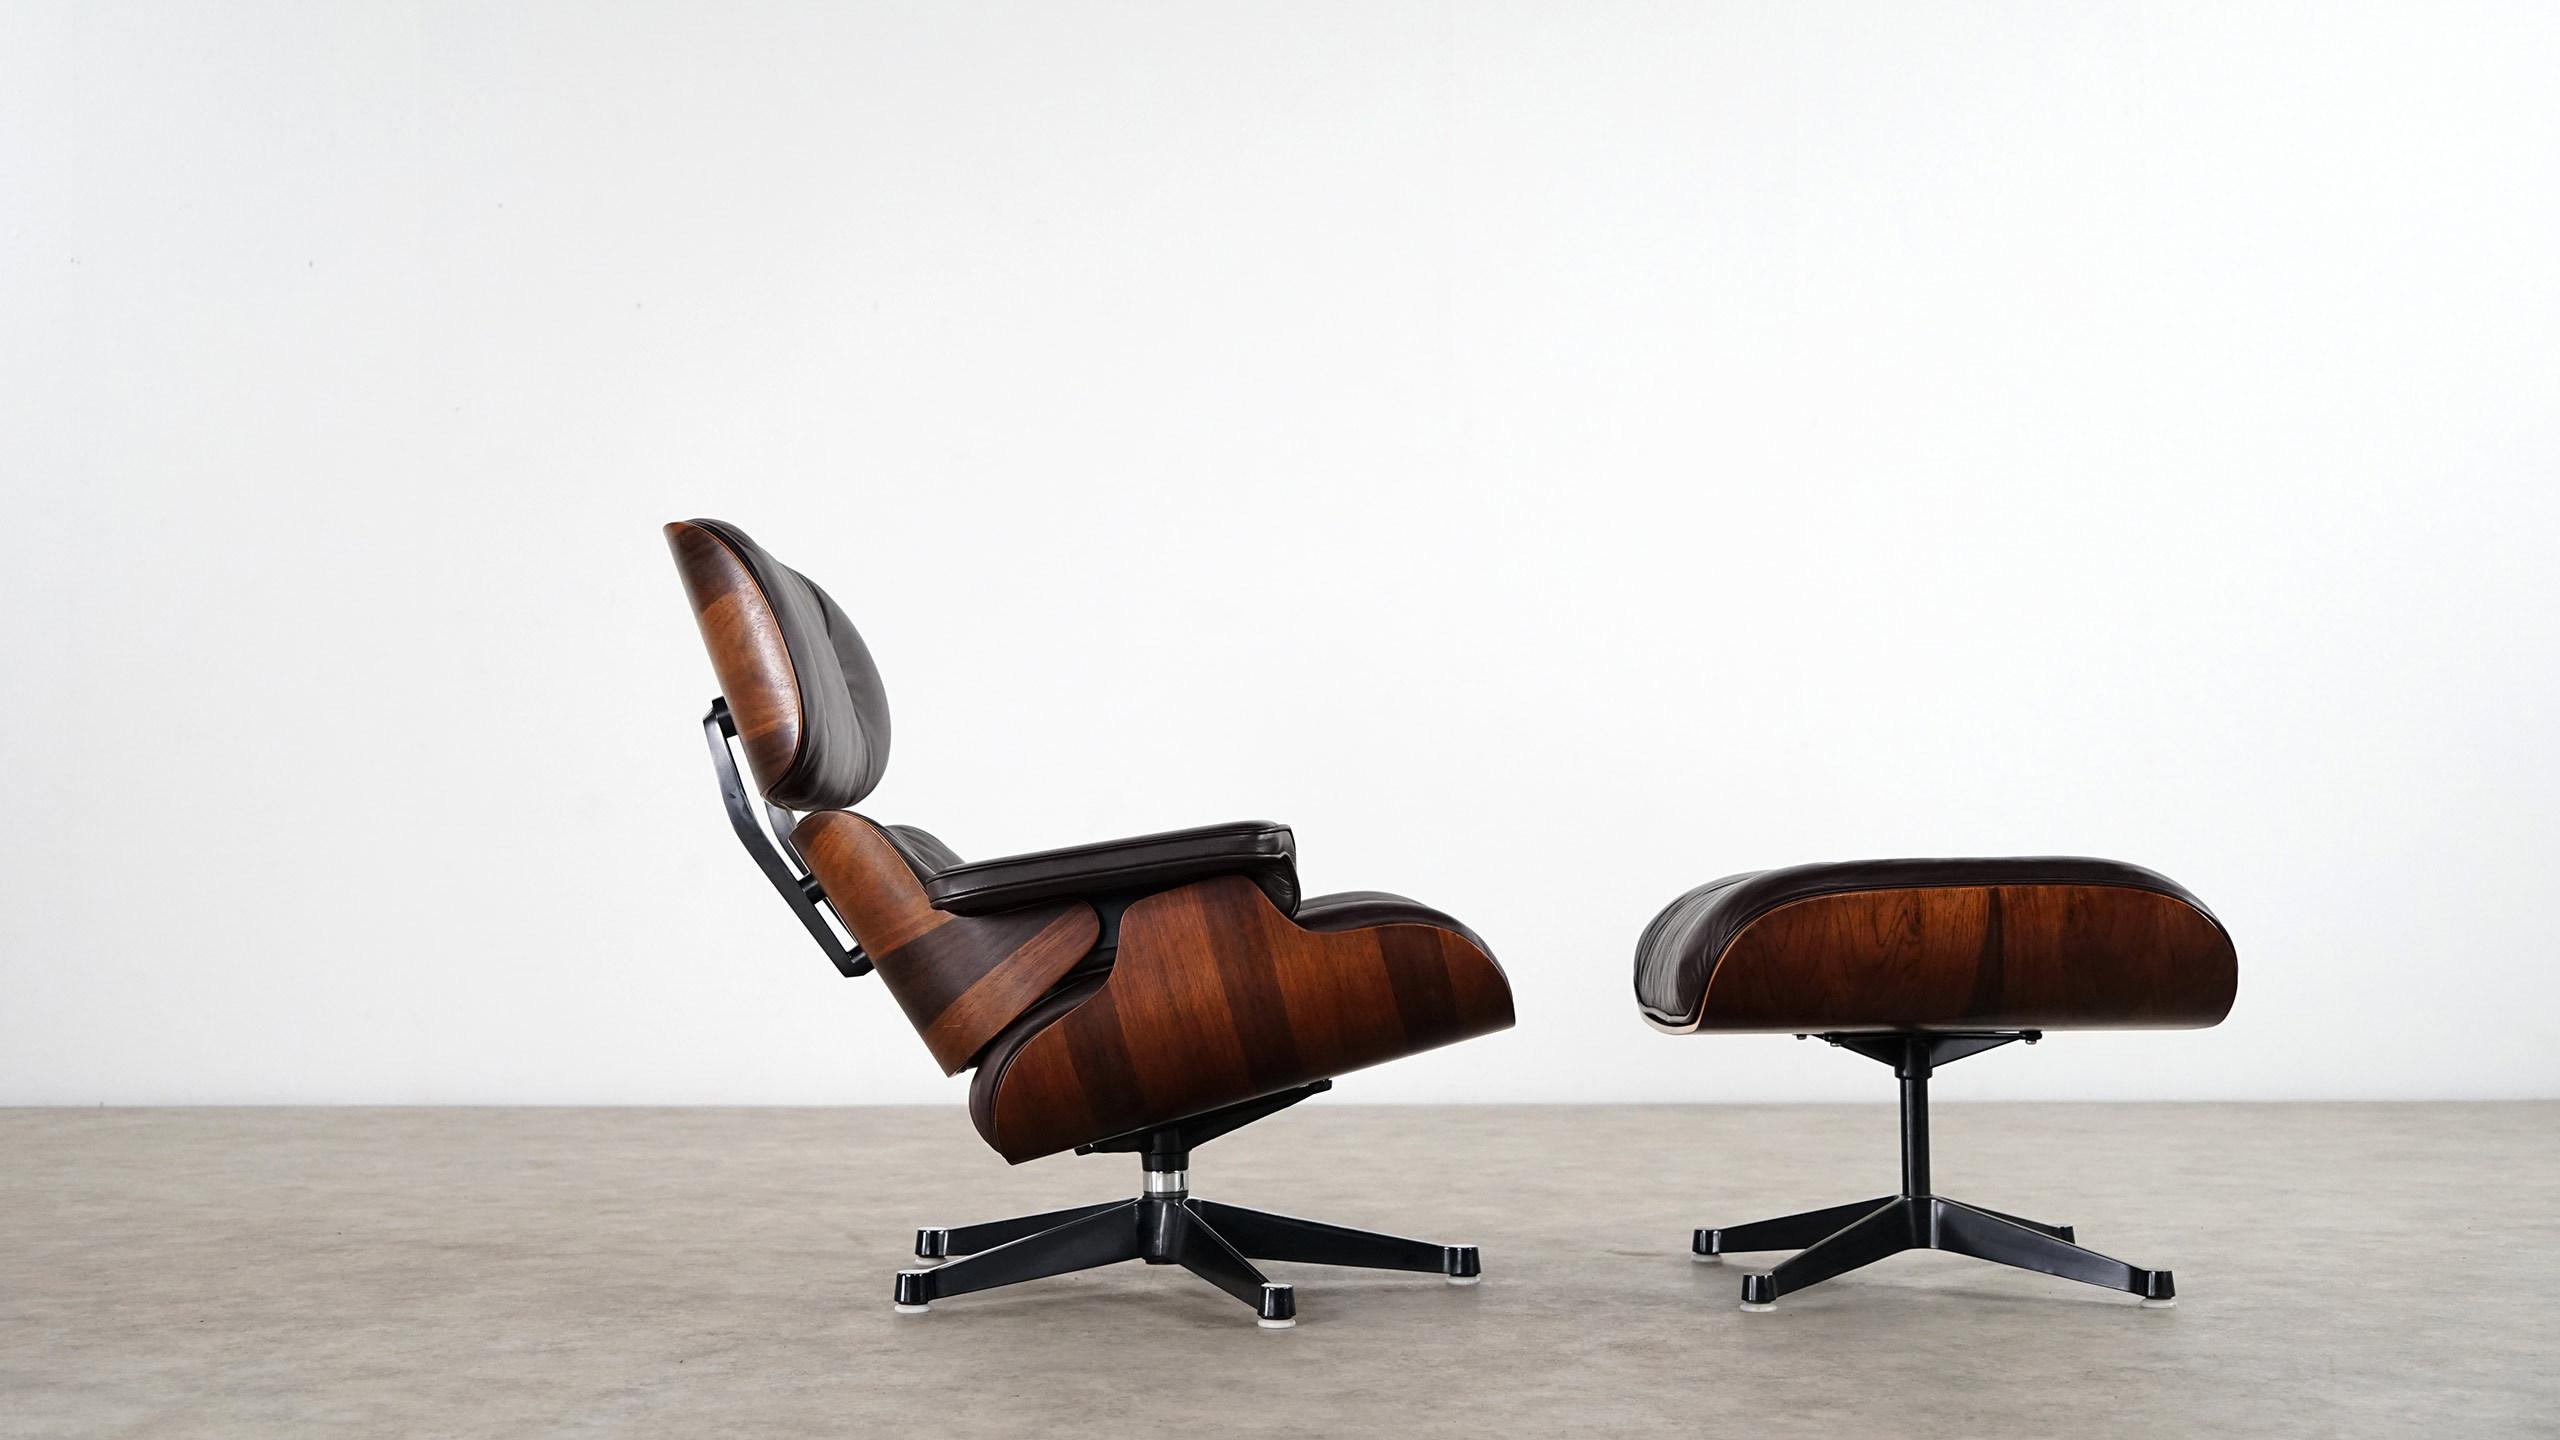 charles eames lounge chair herman miller vitra - Eames Lounge Stuhl Abmessungen